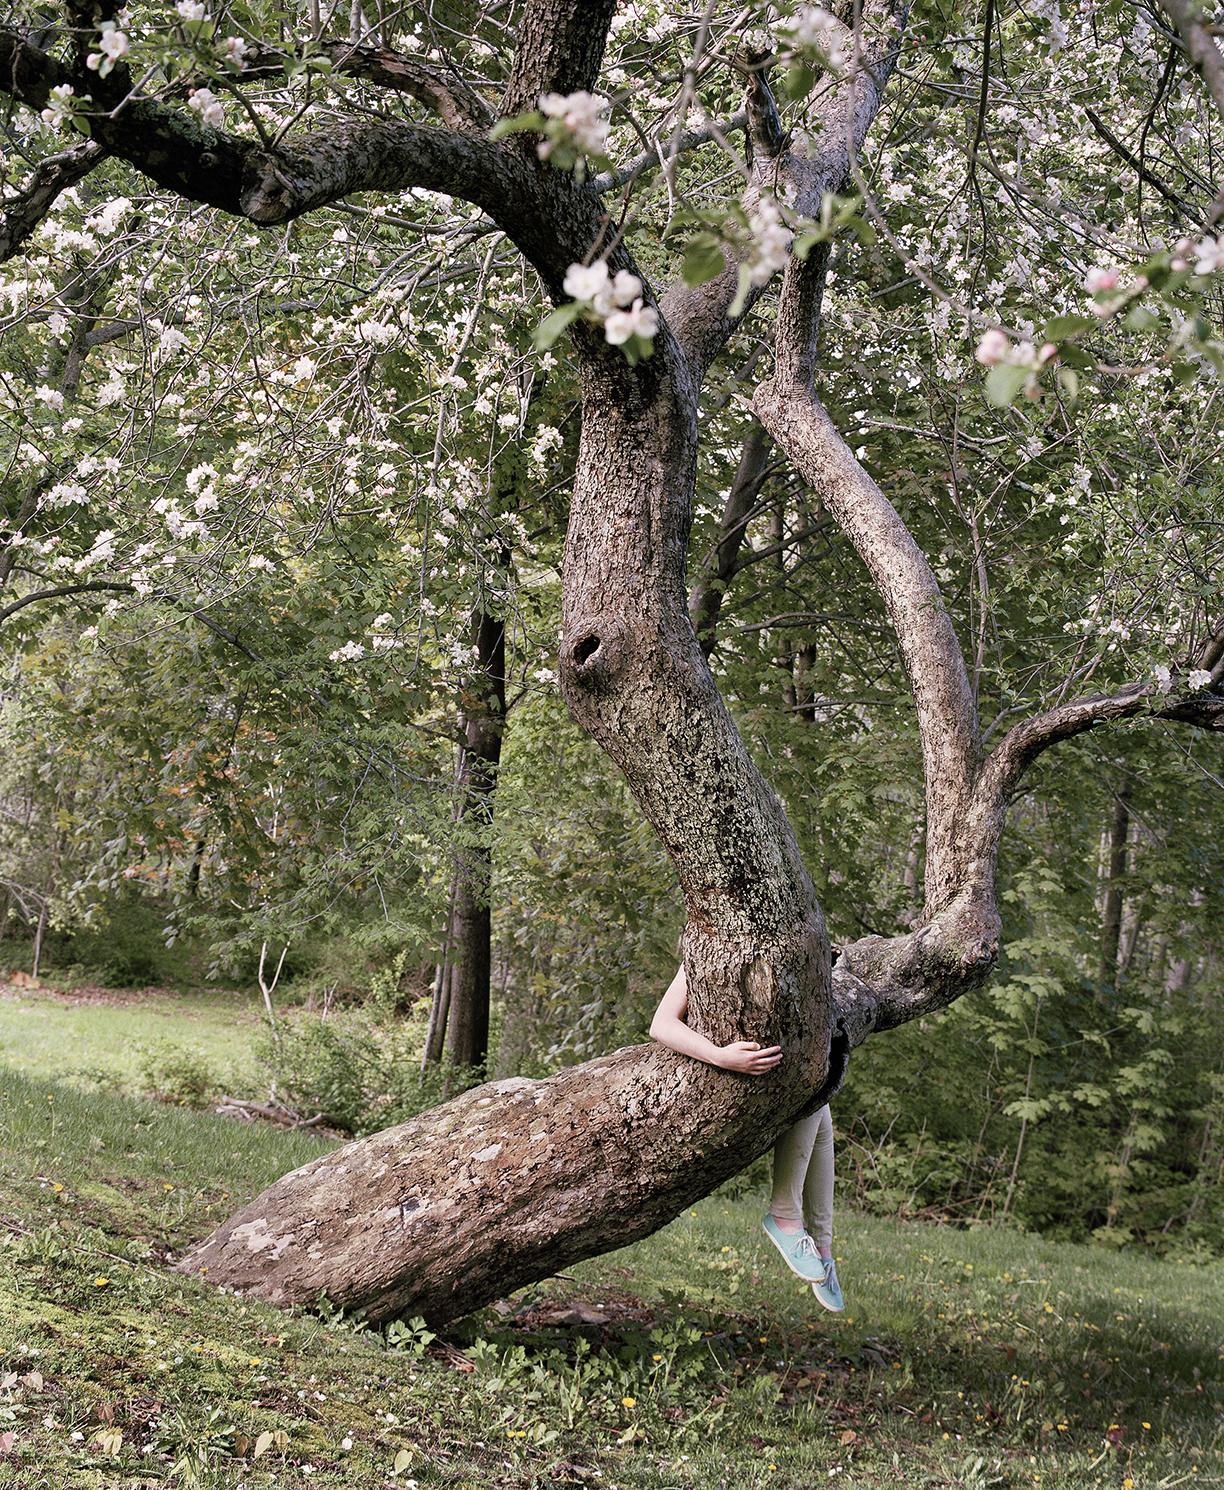 Riding the Apple Tree